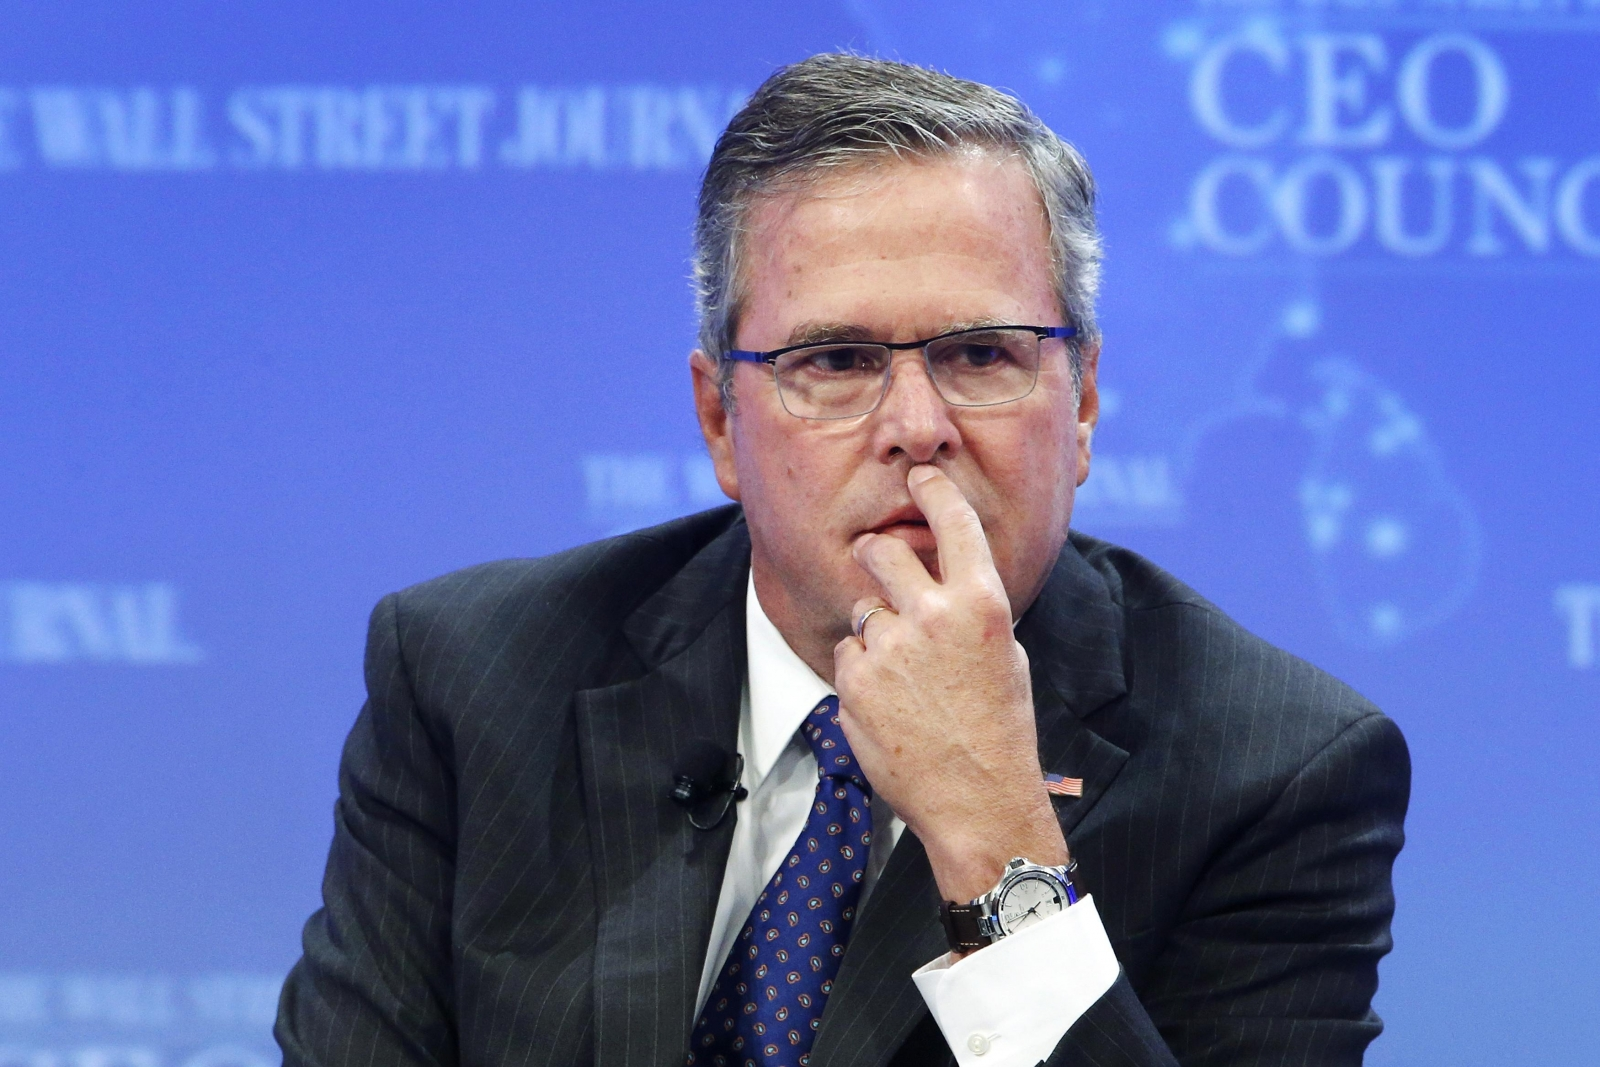 Jeb Bush explores 2016 US presidential run